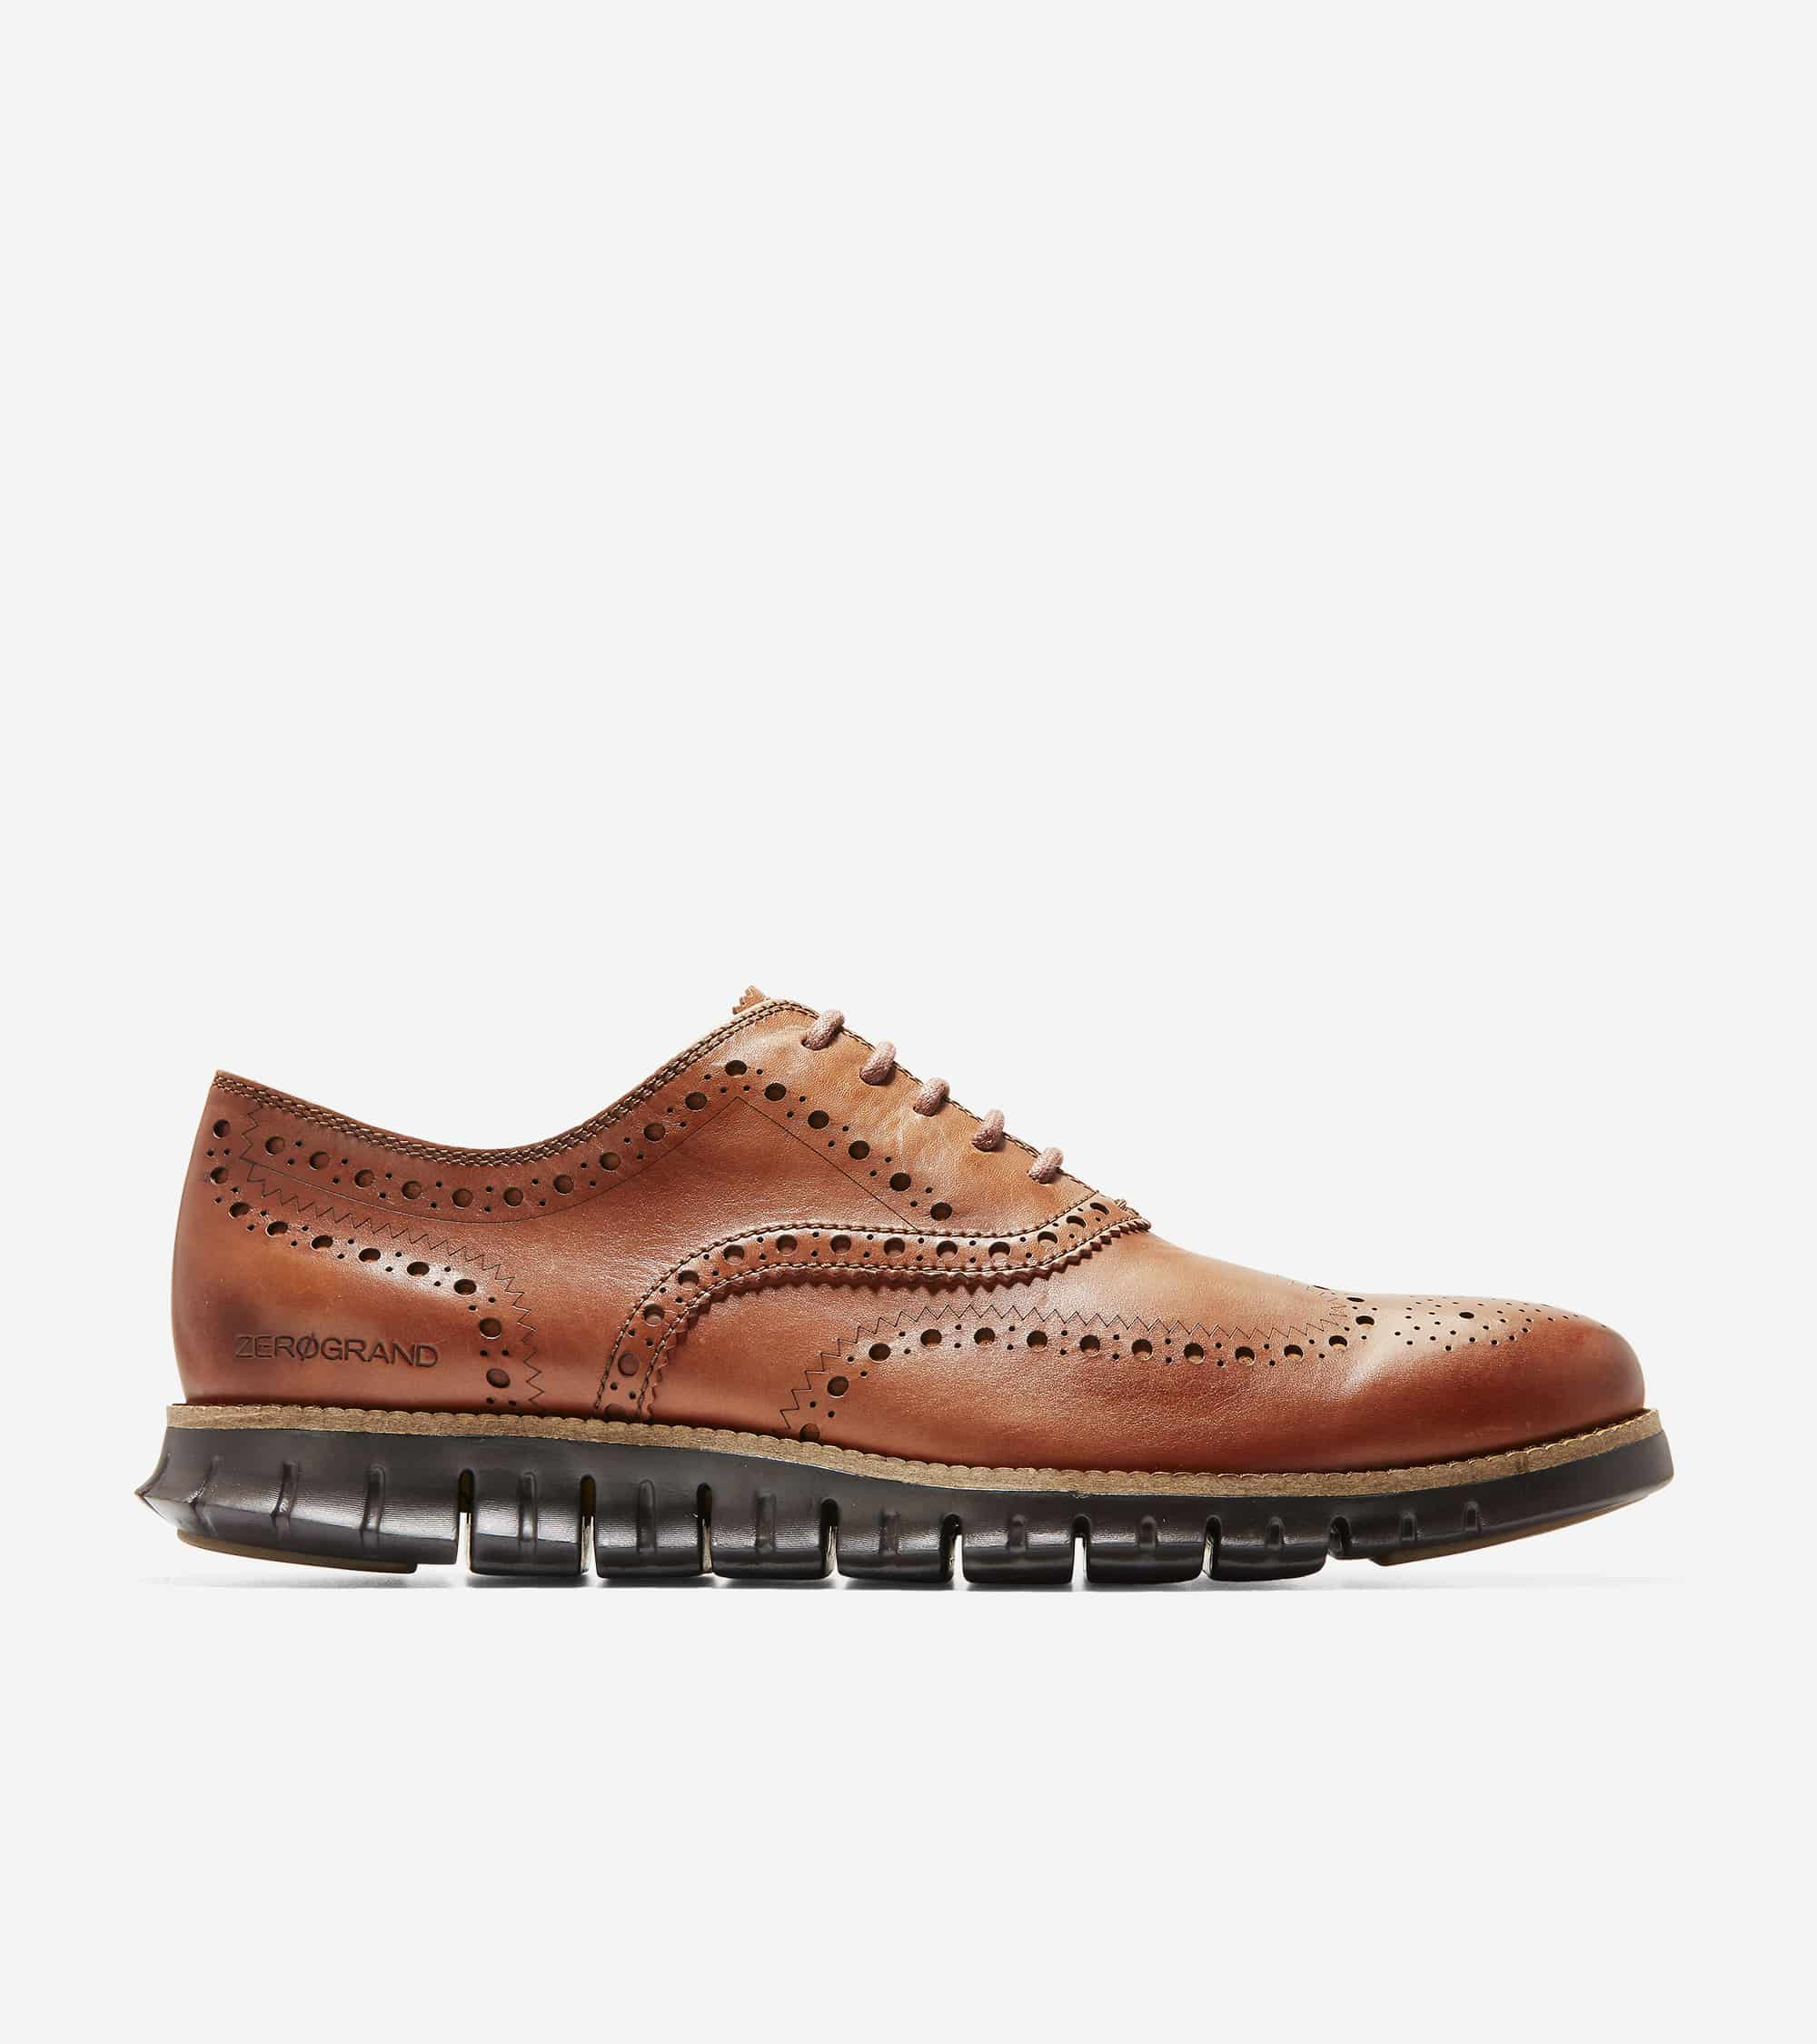 Cole Haan ZERØGRAND Wingtip Oxford British Tan Leather/Java